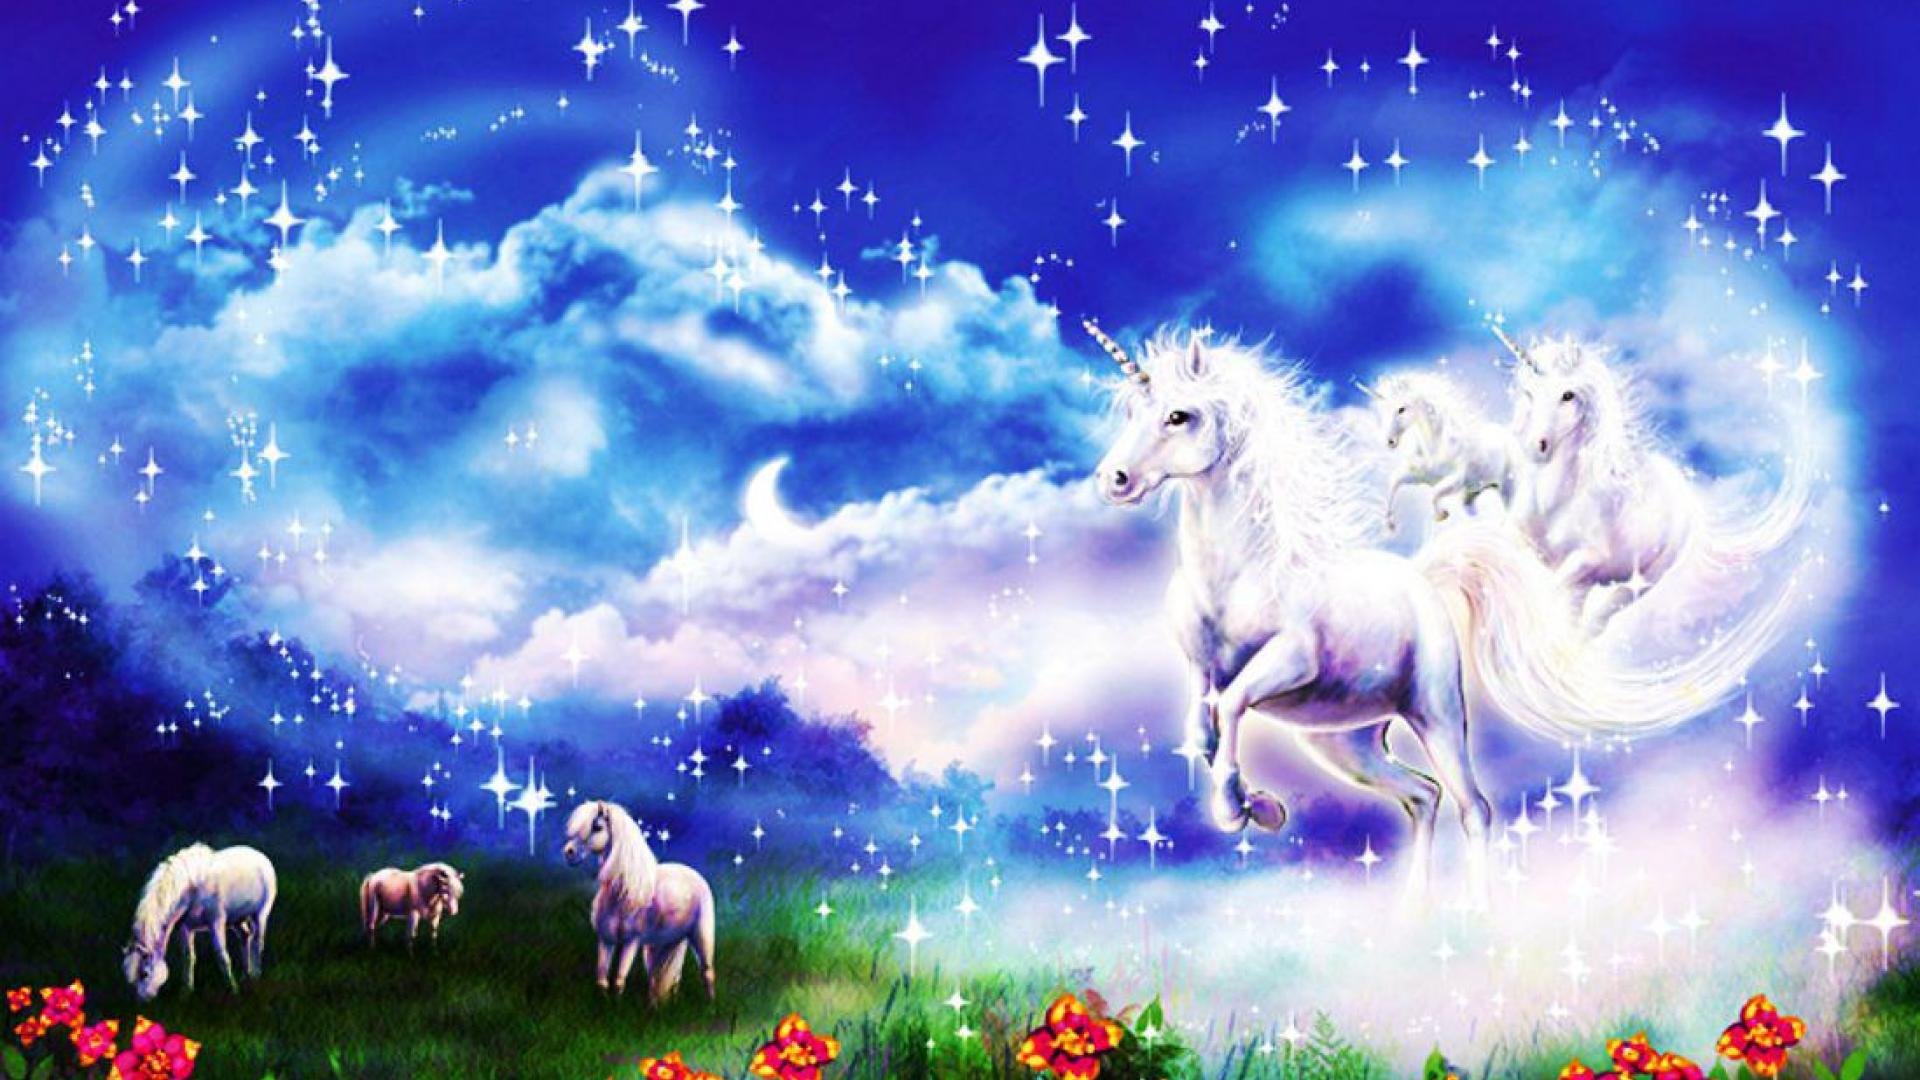 37 Hd Unicorn Wallpaper On Wallpapersafari